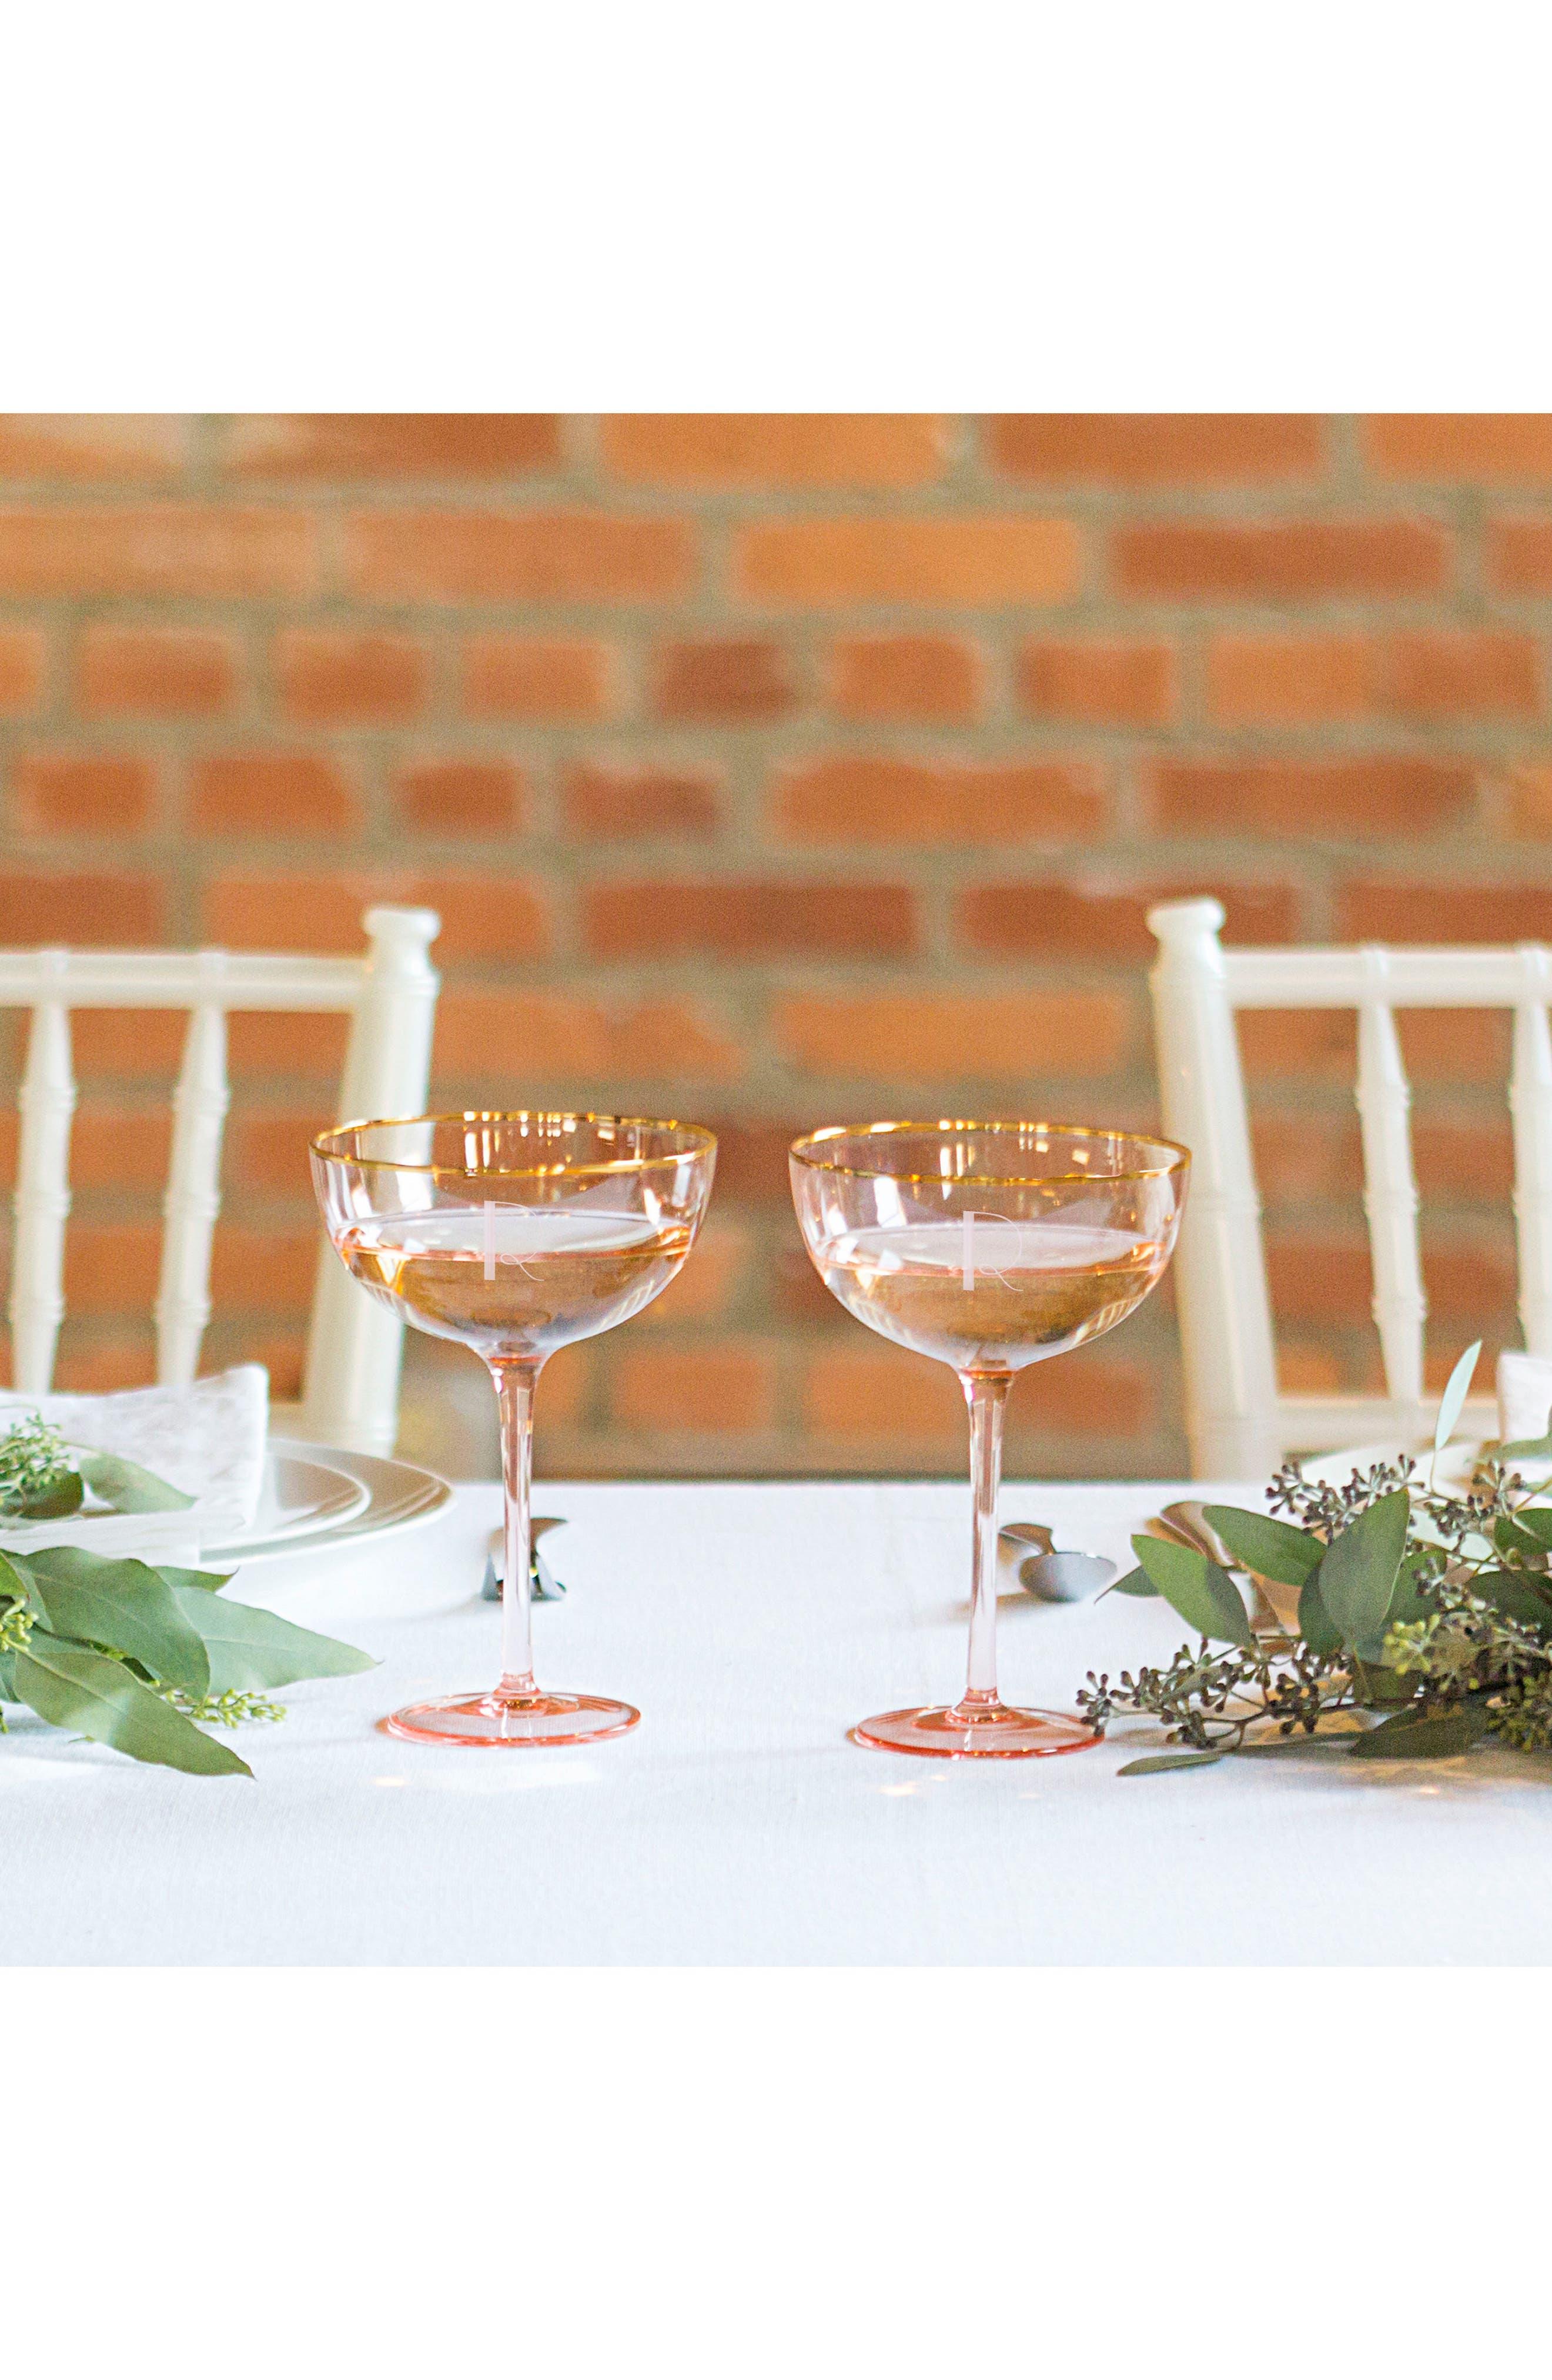 Monogram Set of 2 Champagne Coupes,                             Alternate thumbnail 7, color,                             220